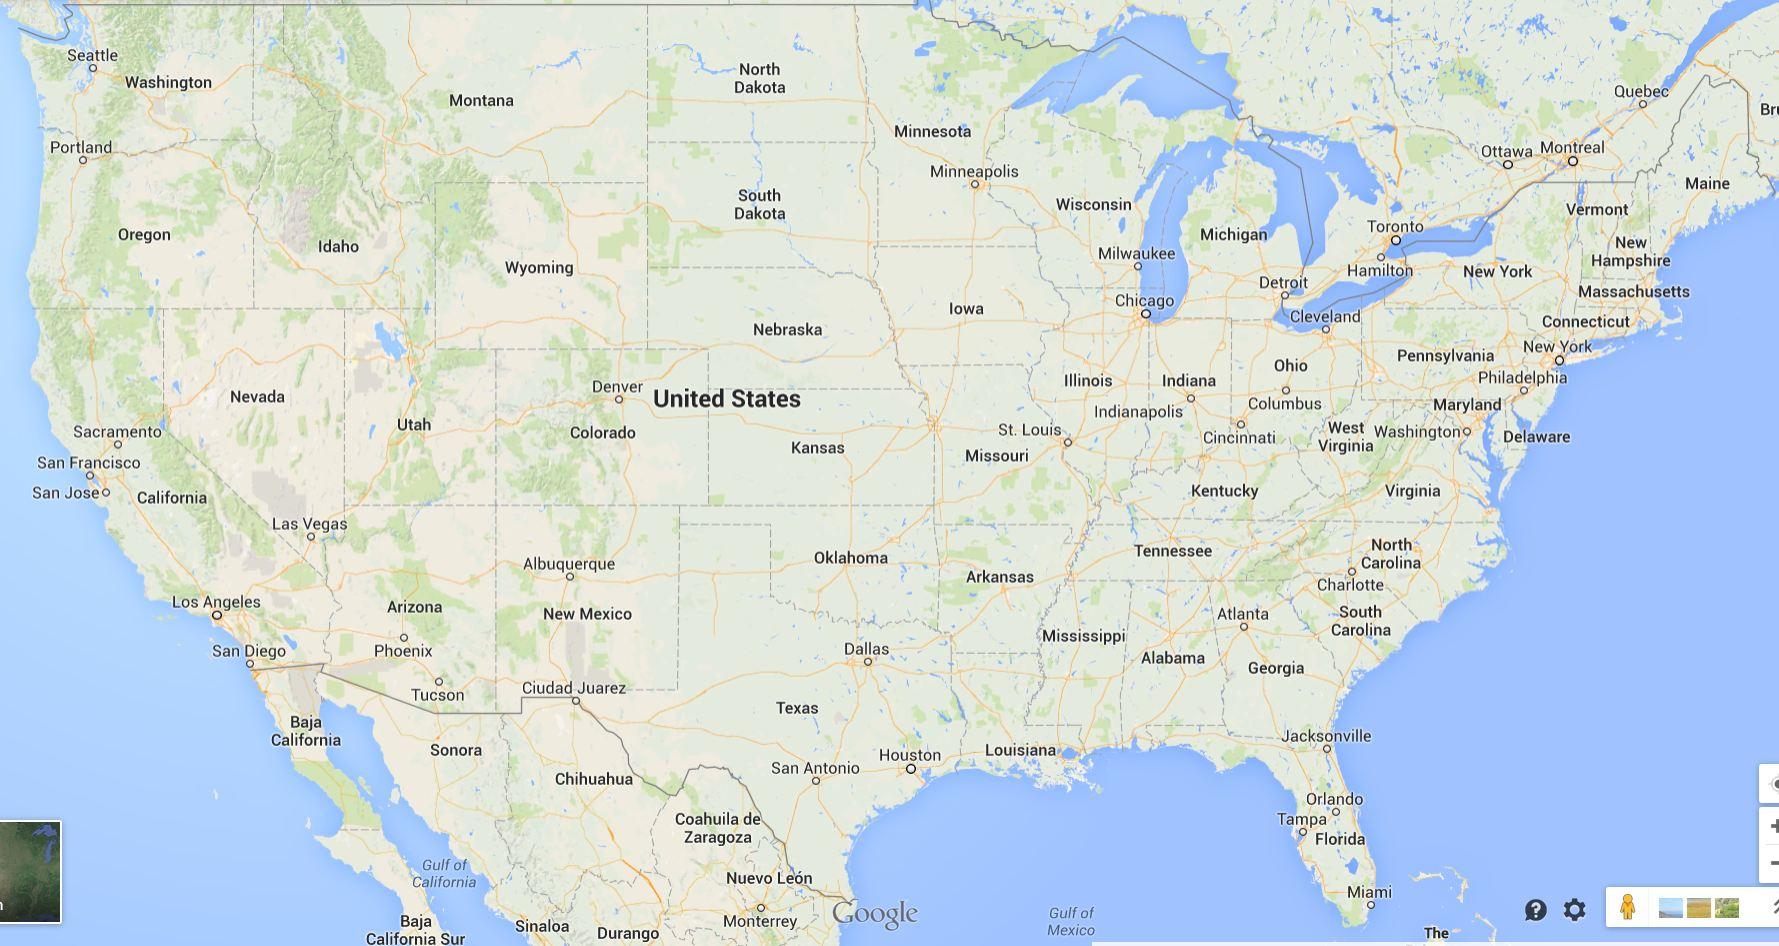 Google Maps Usa States And Travel Information | Download Free Google - South Florida Map Google